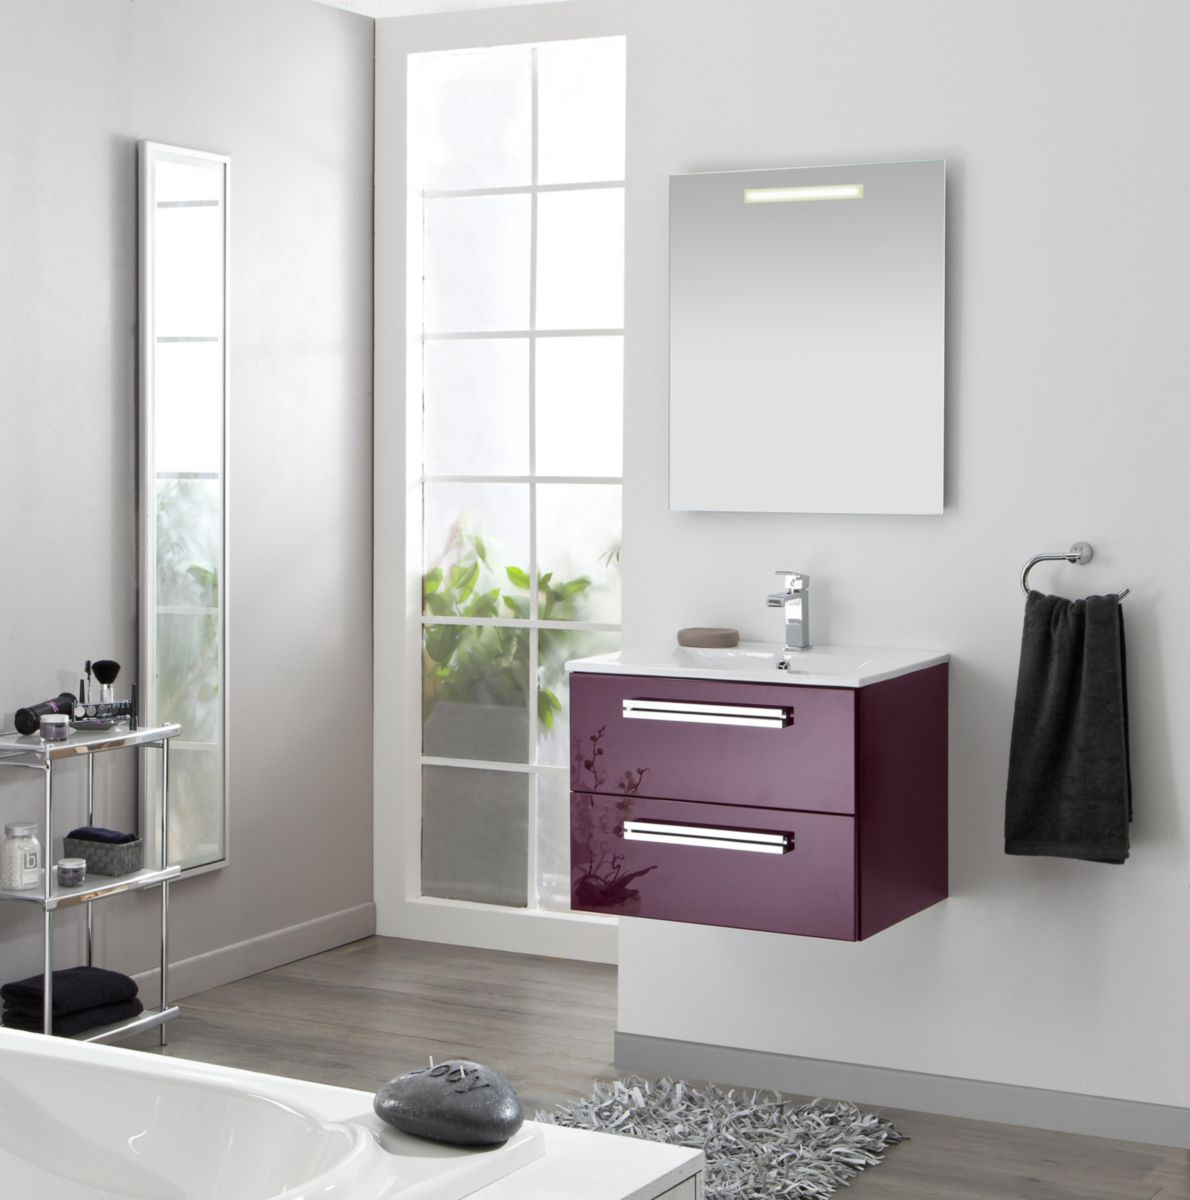 Salle De Bain Cedeo Avis ~ meuble sous vasque seducta 60 cm 2 tiroirs aubergine alterna